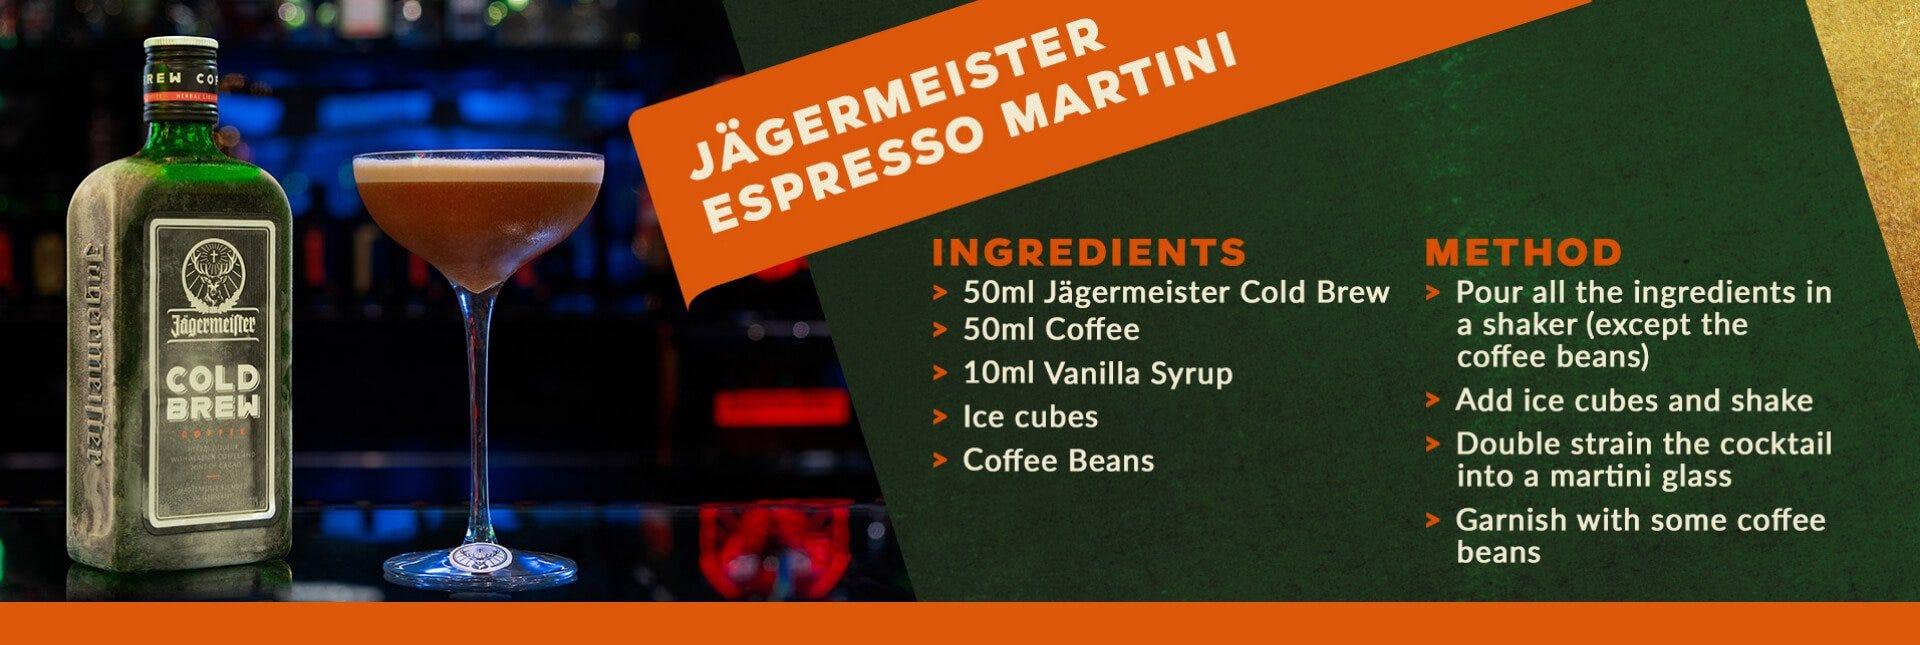 Jagermeister espresso martini cocktail